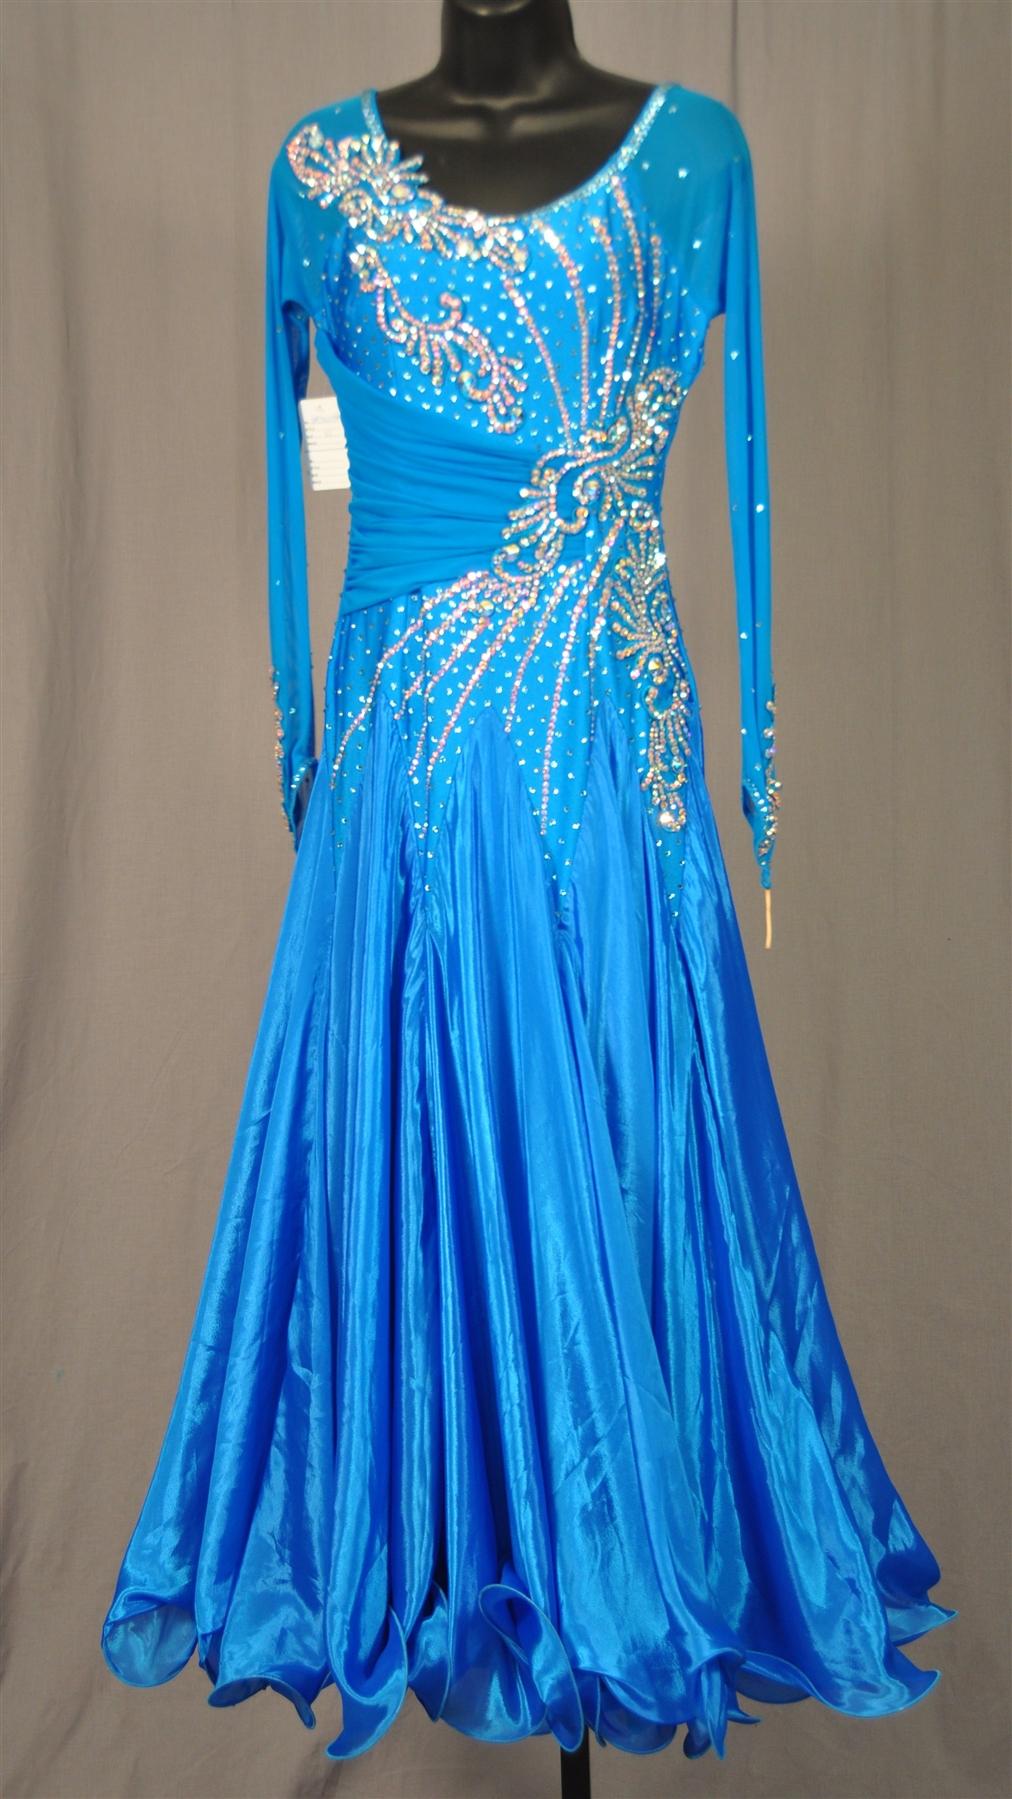 Elegant Electric Blue Ballroom Dress